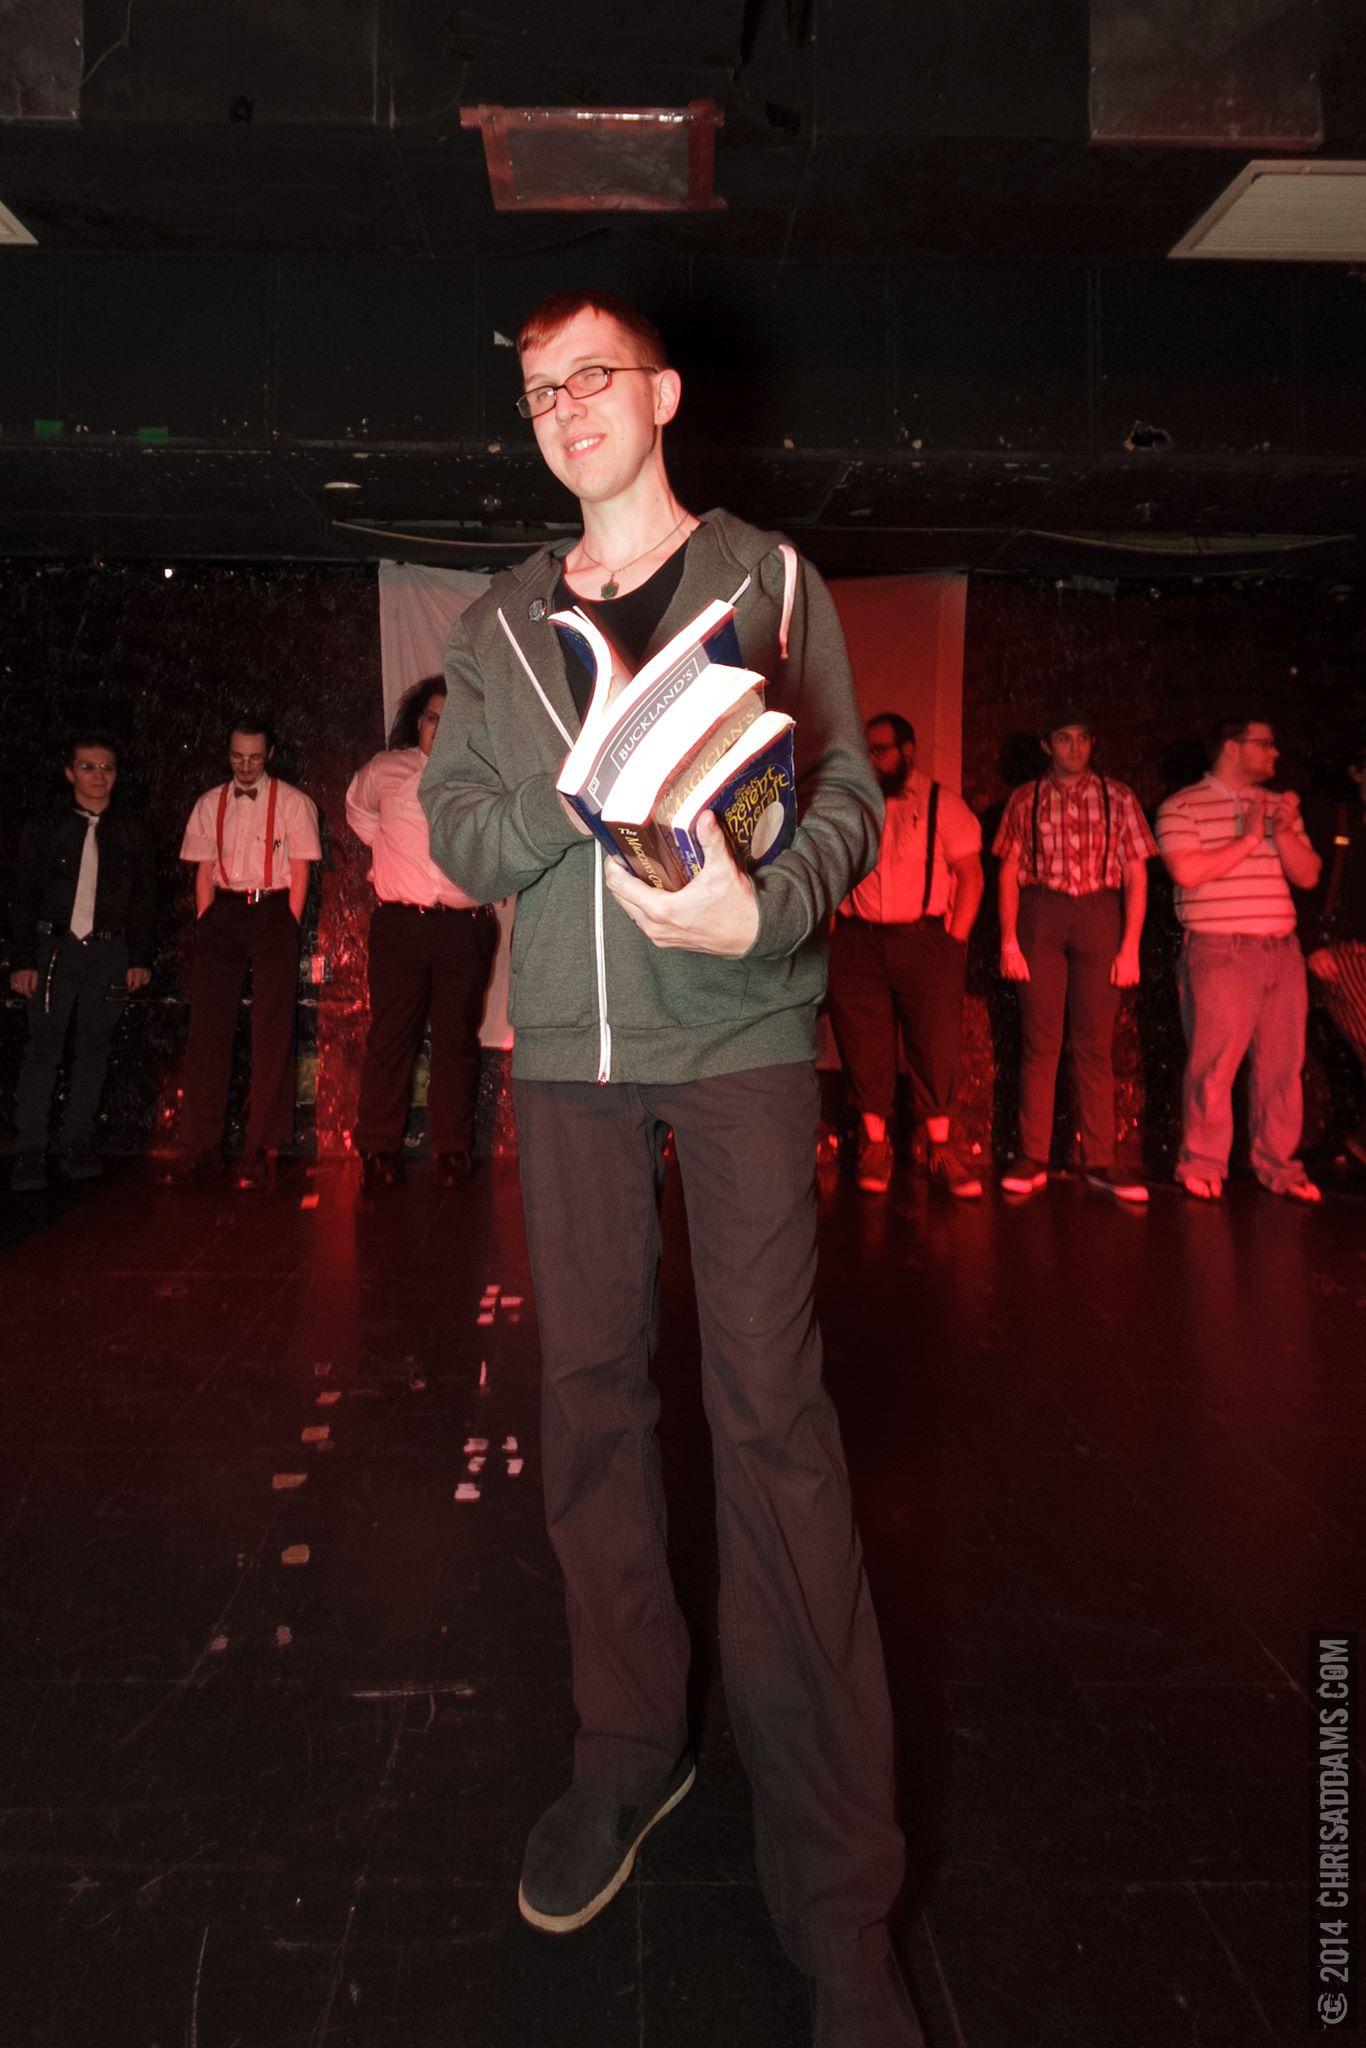 TheHavenClub-Goth-Industrial-Dance-Alternative-Northampton-MA (8).jpg